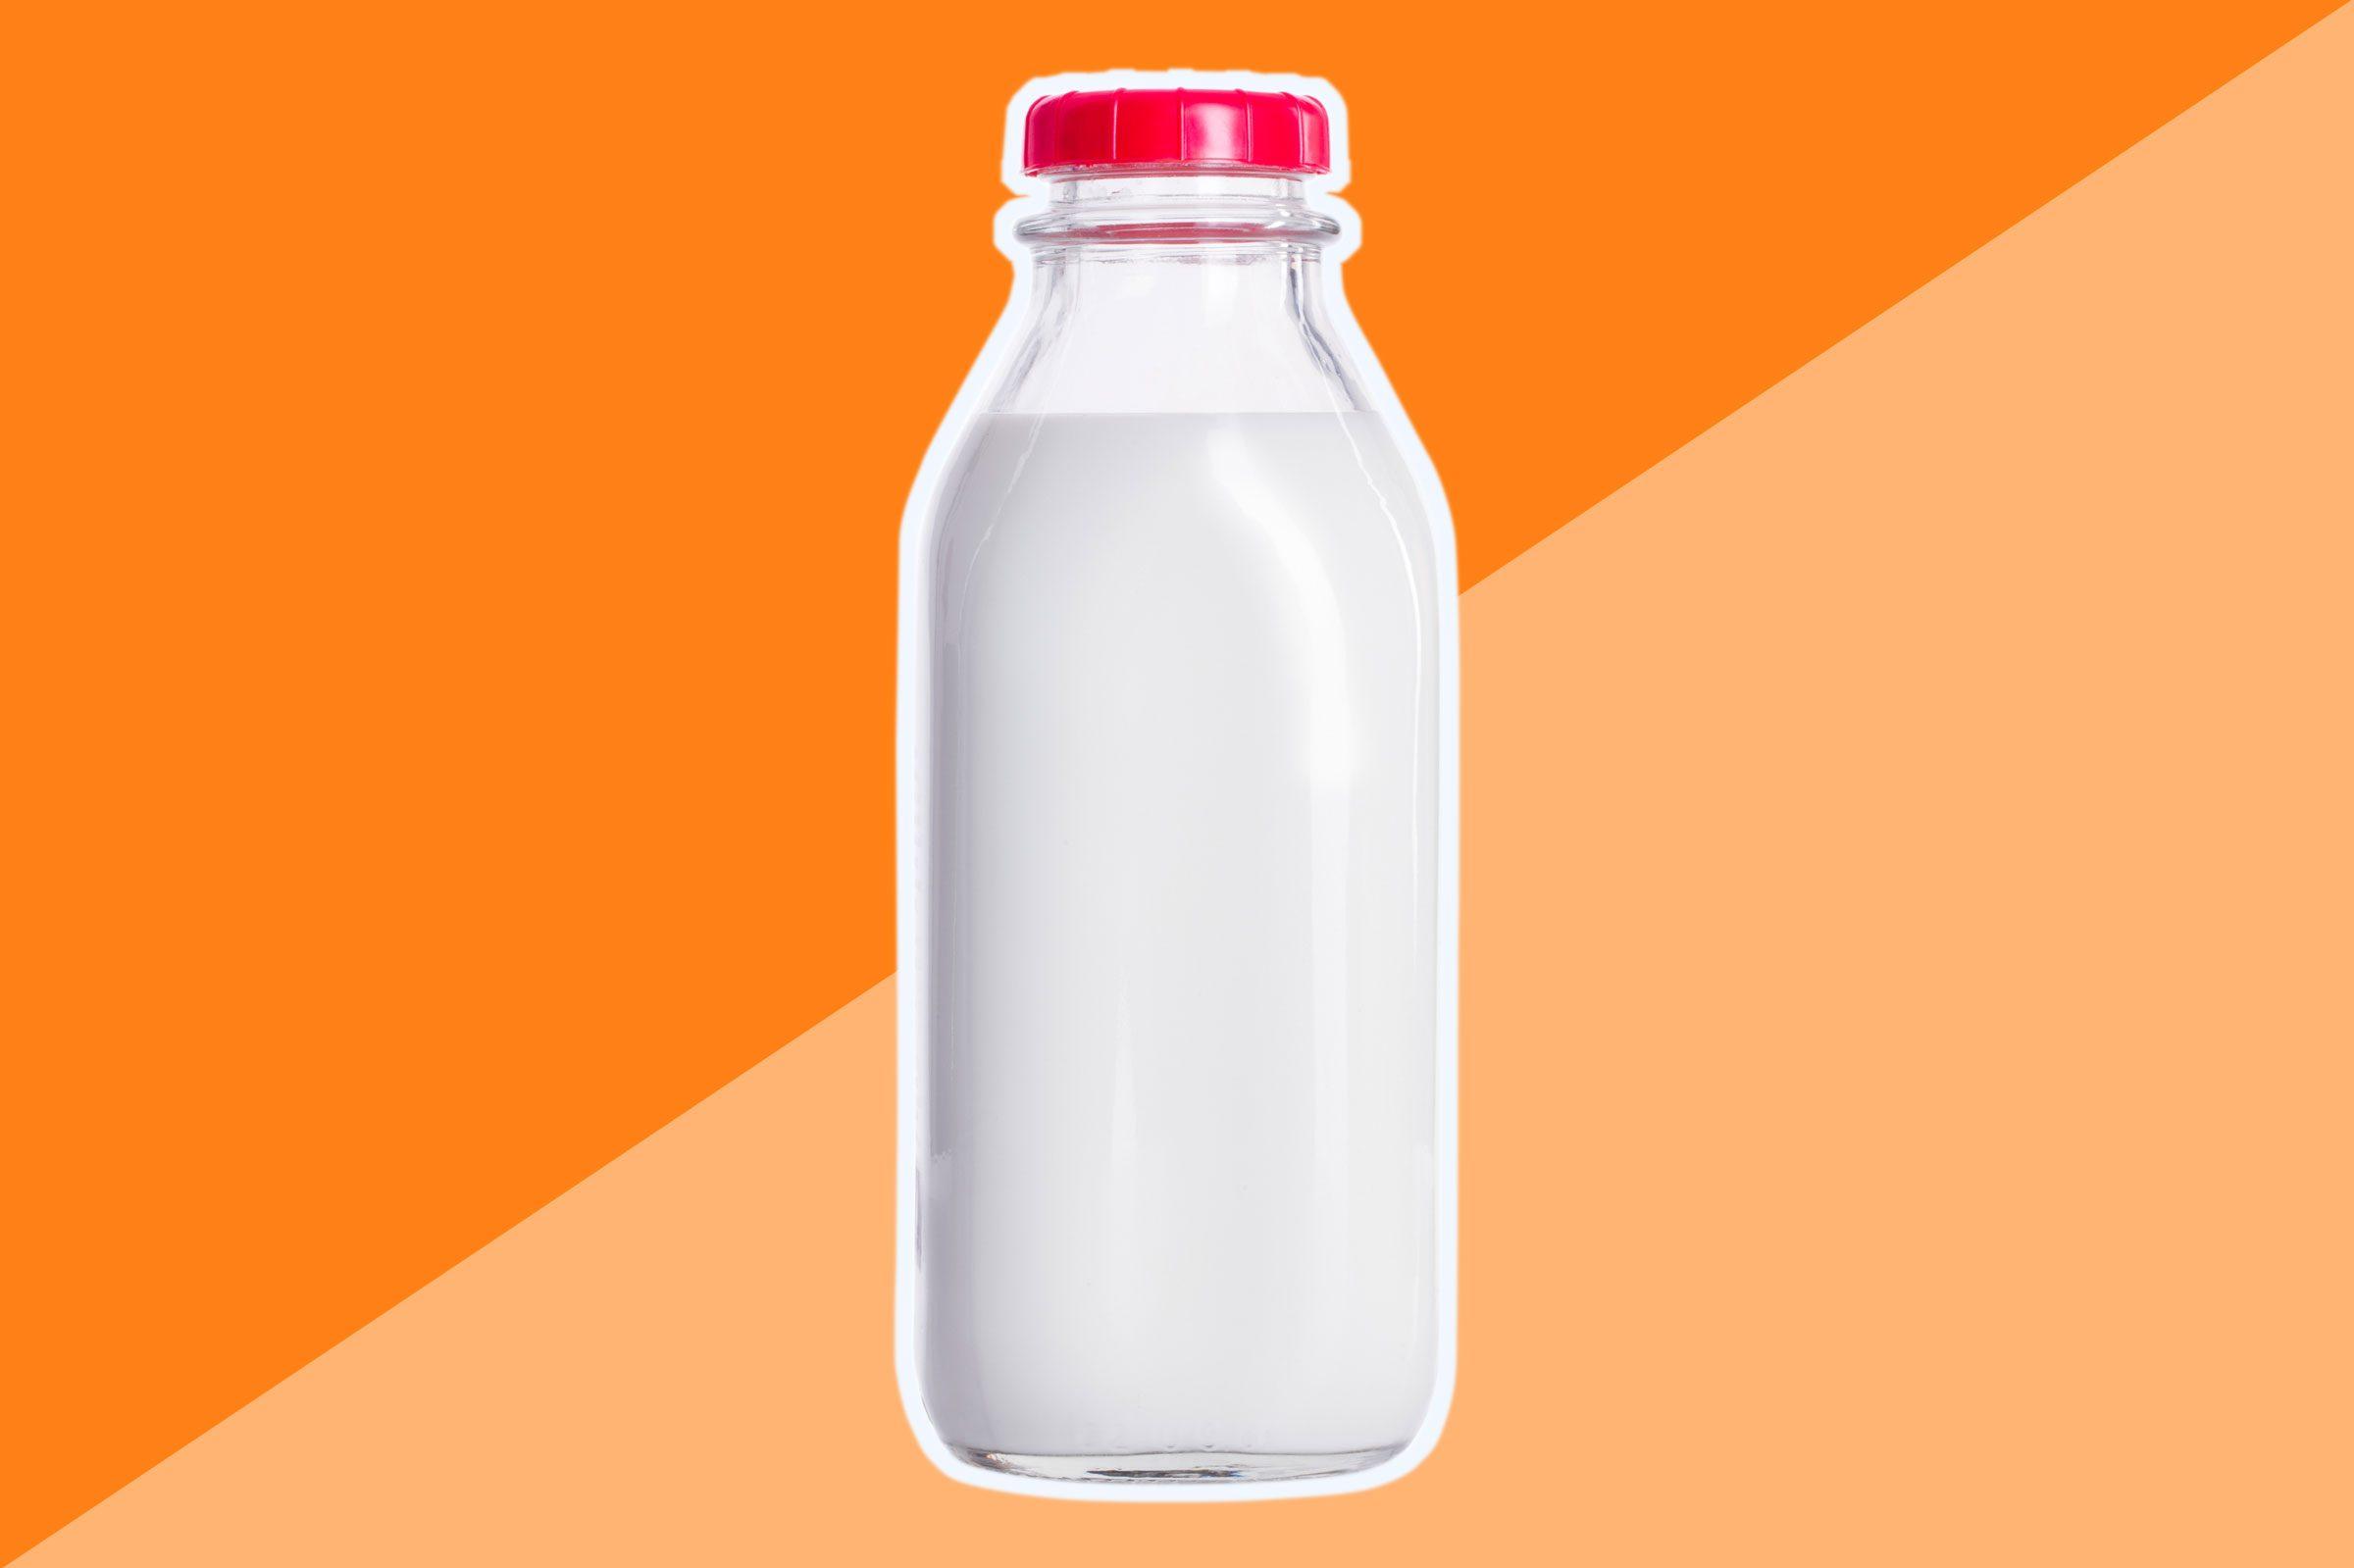 Fortified Milk